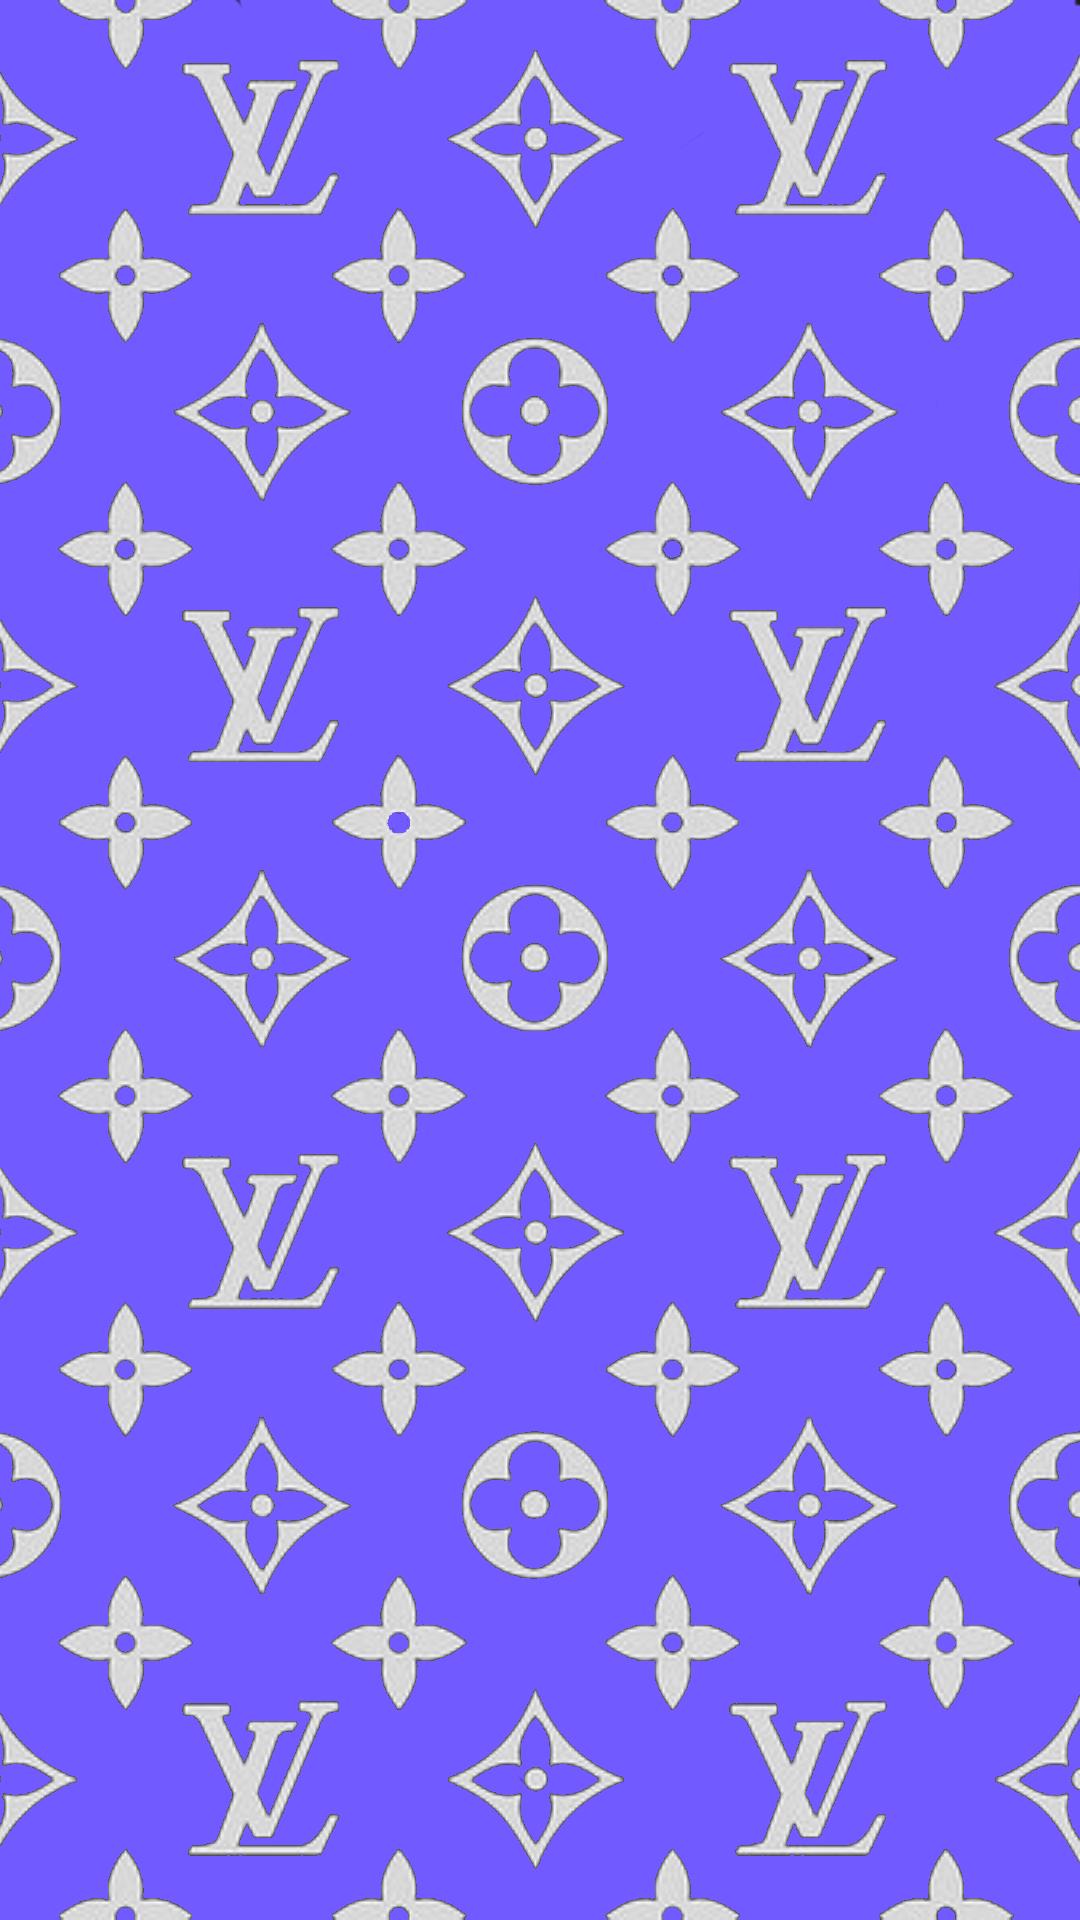 Nottiuv Siuol Eulb Louis Vuitton Aesthetic Wallpaper Blue Louis Vuitton Iphone Wallpaper Louis Vuitton Pattern Louis Vuitton Background